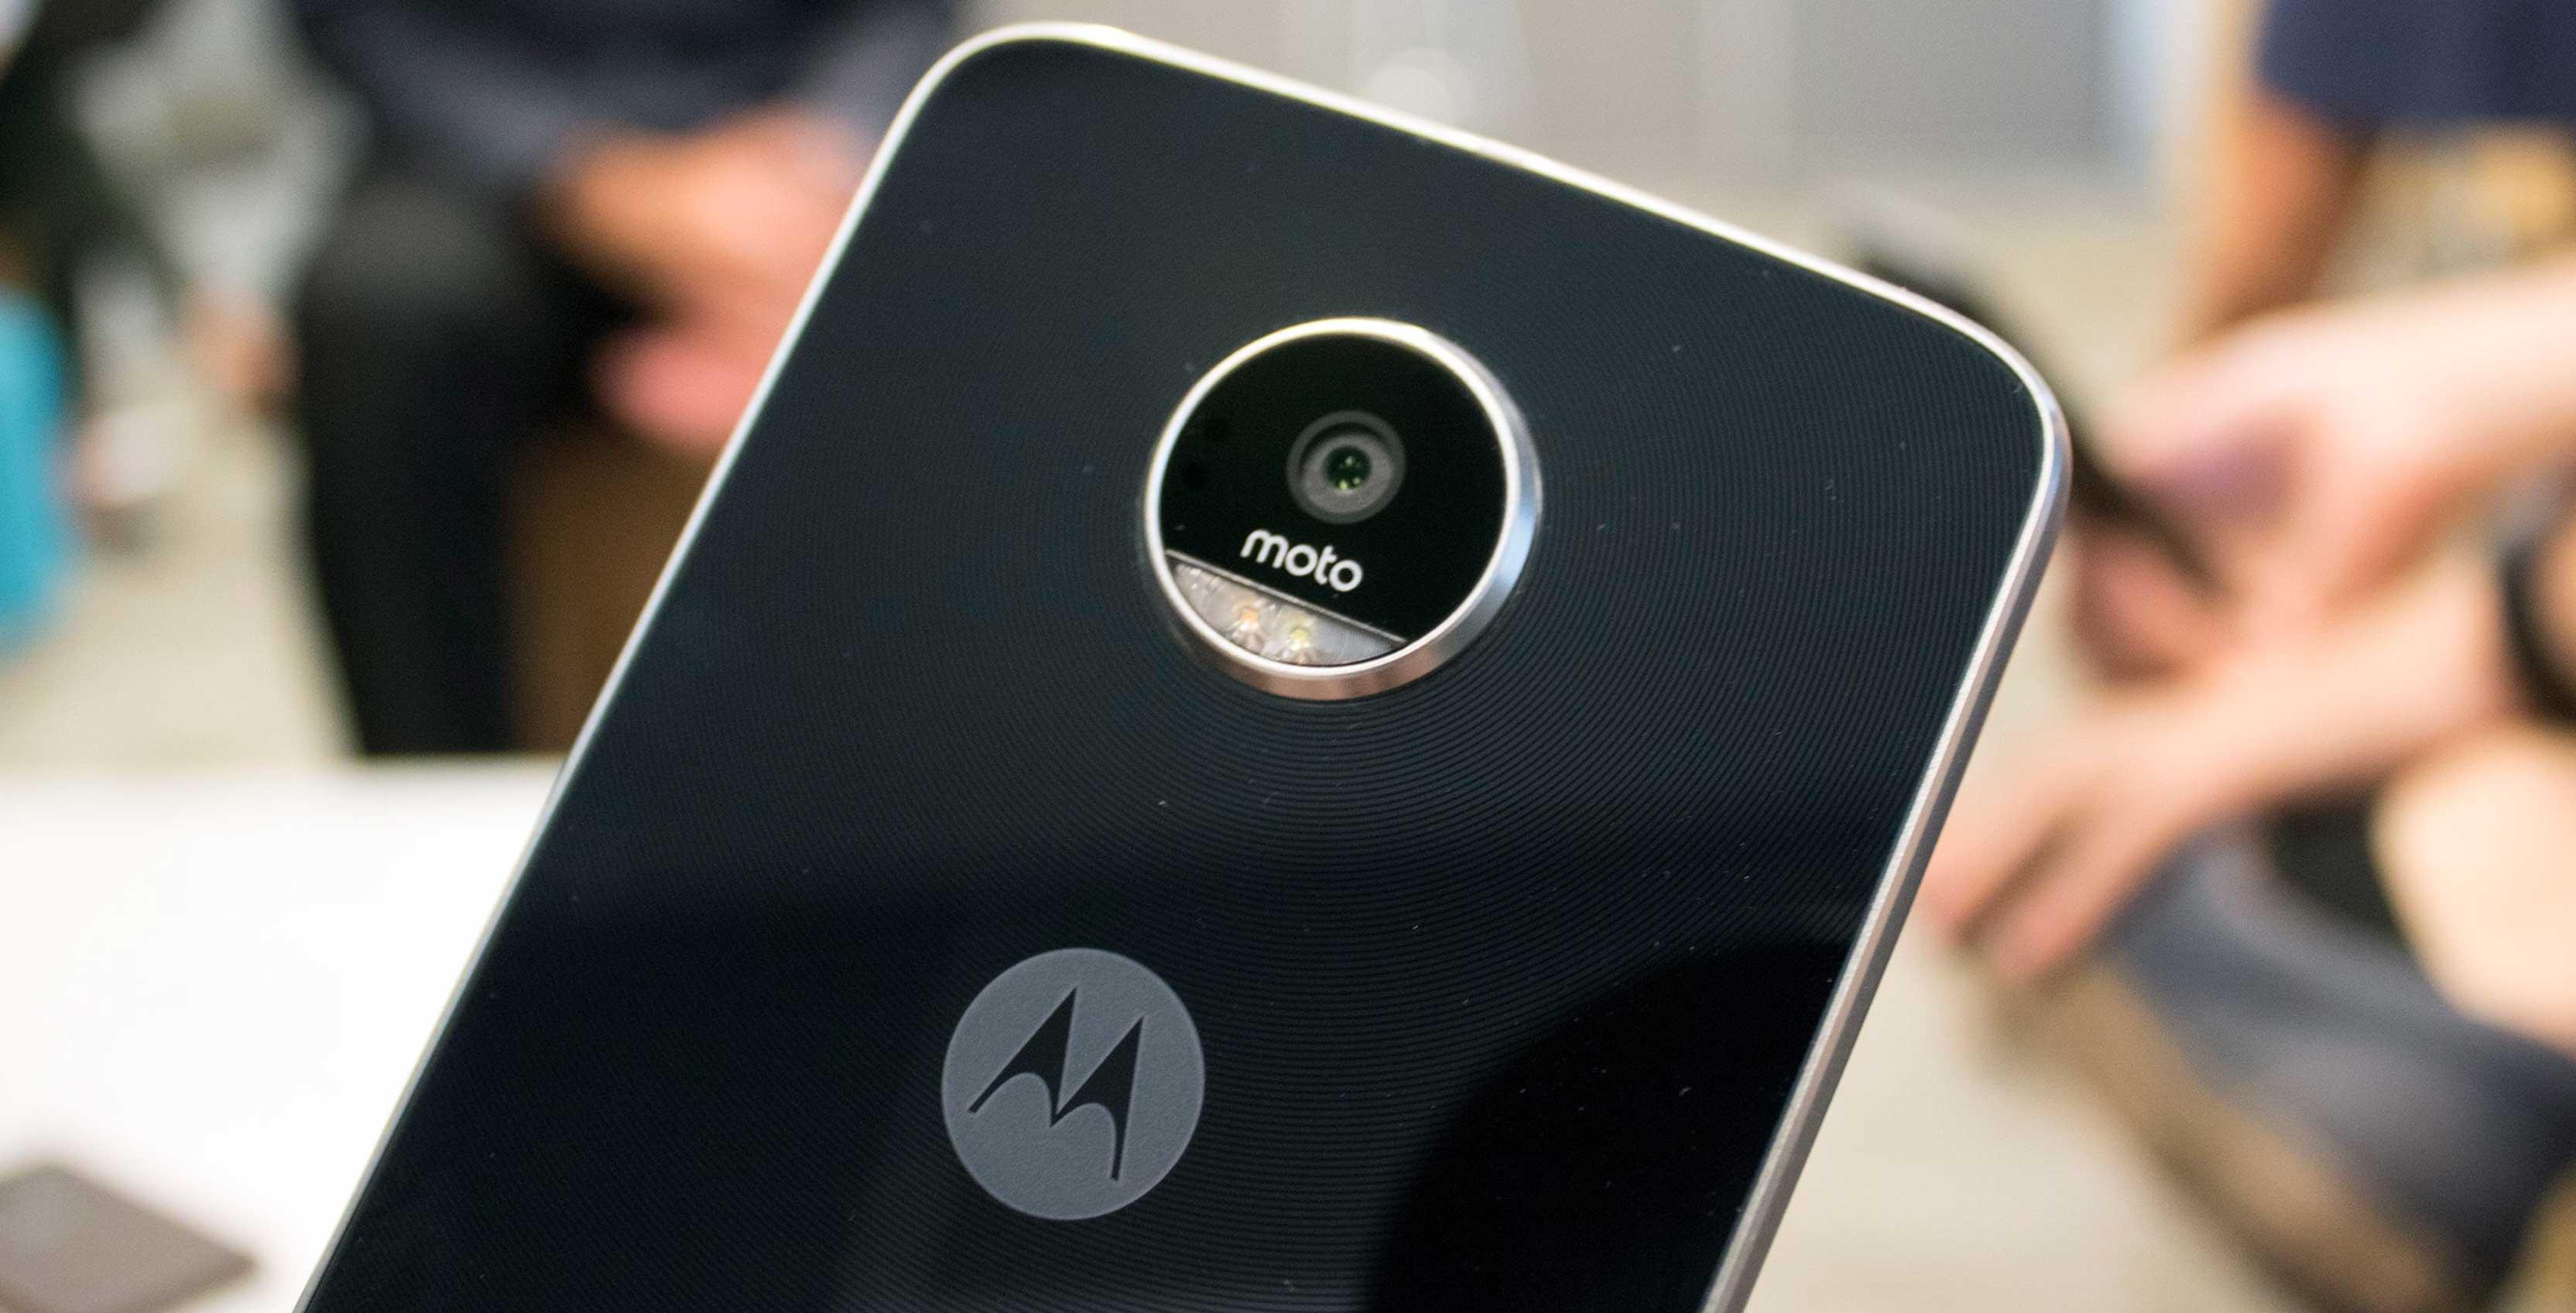 Motorola logo on phone